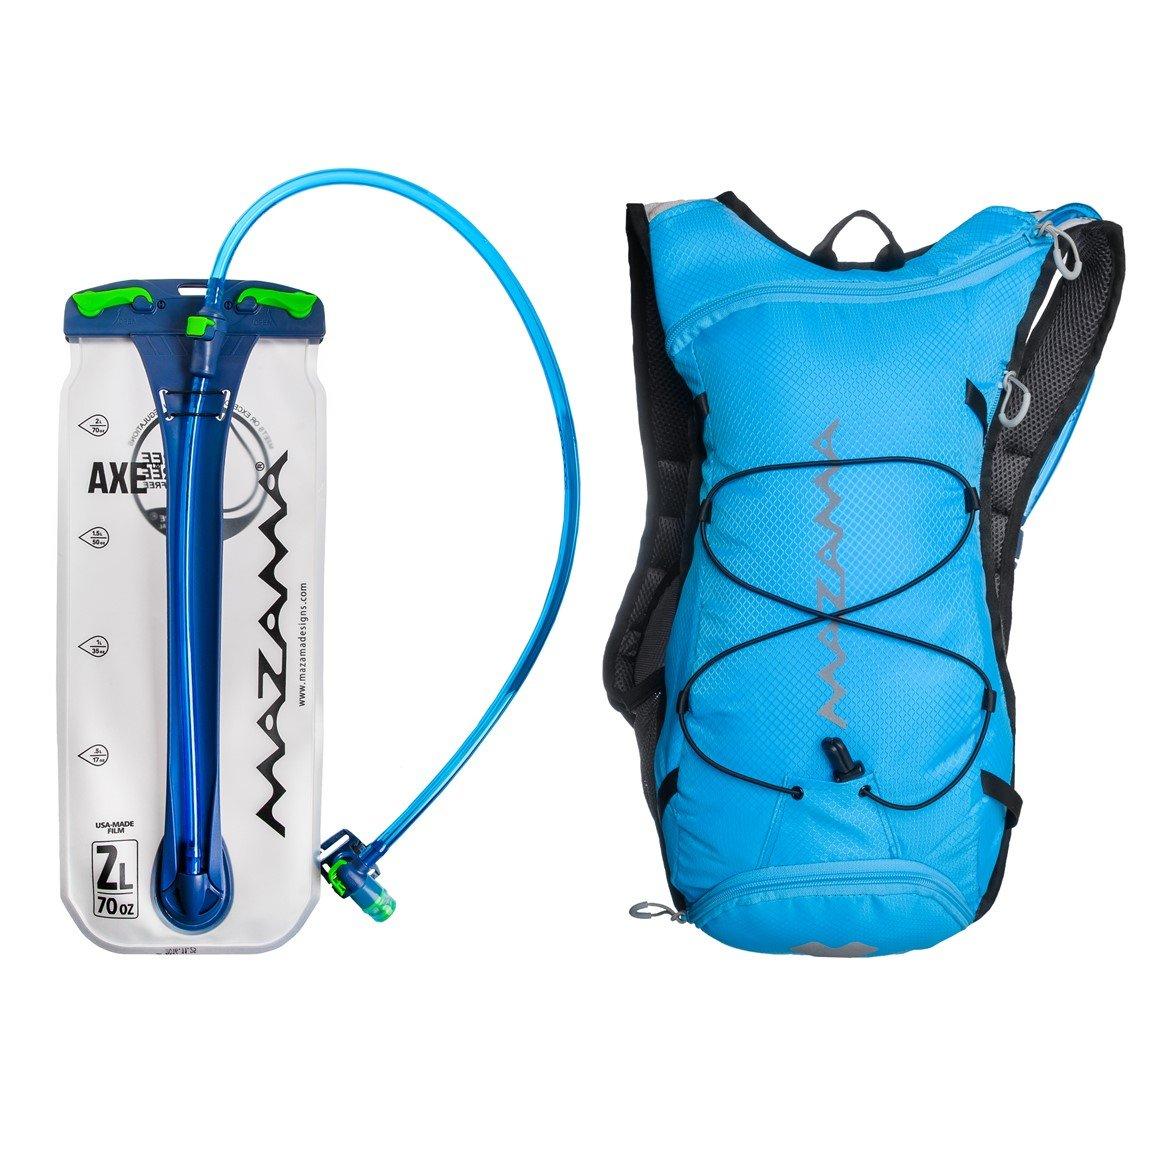 Hydration Reservoir Pack - 2 or 3 Liter Water Bladder - Tasteless & BPA Free - Multifunction Kit - USA Made Film - Mazama - Tumalo (Blue 2L)